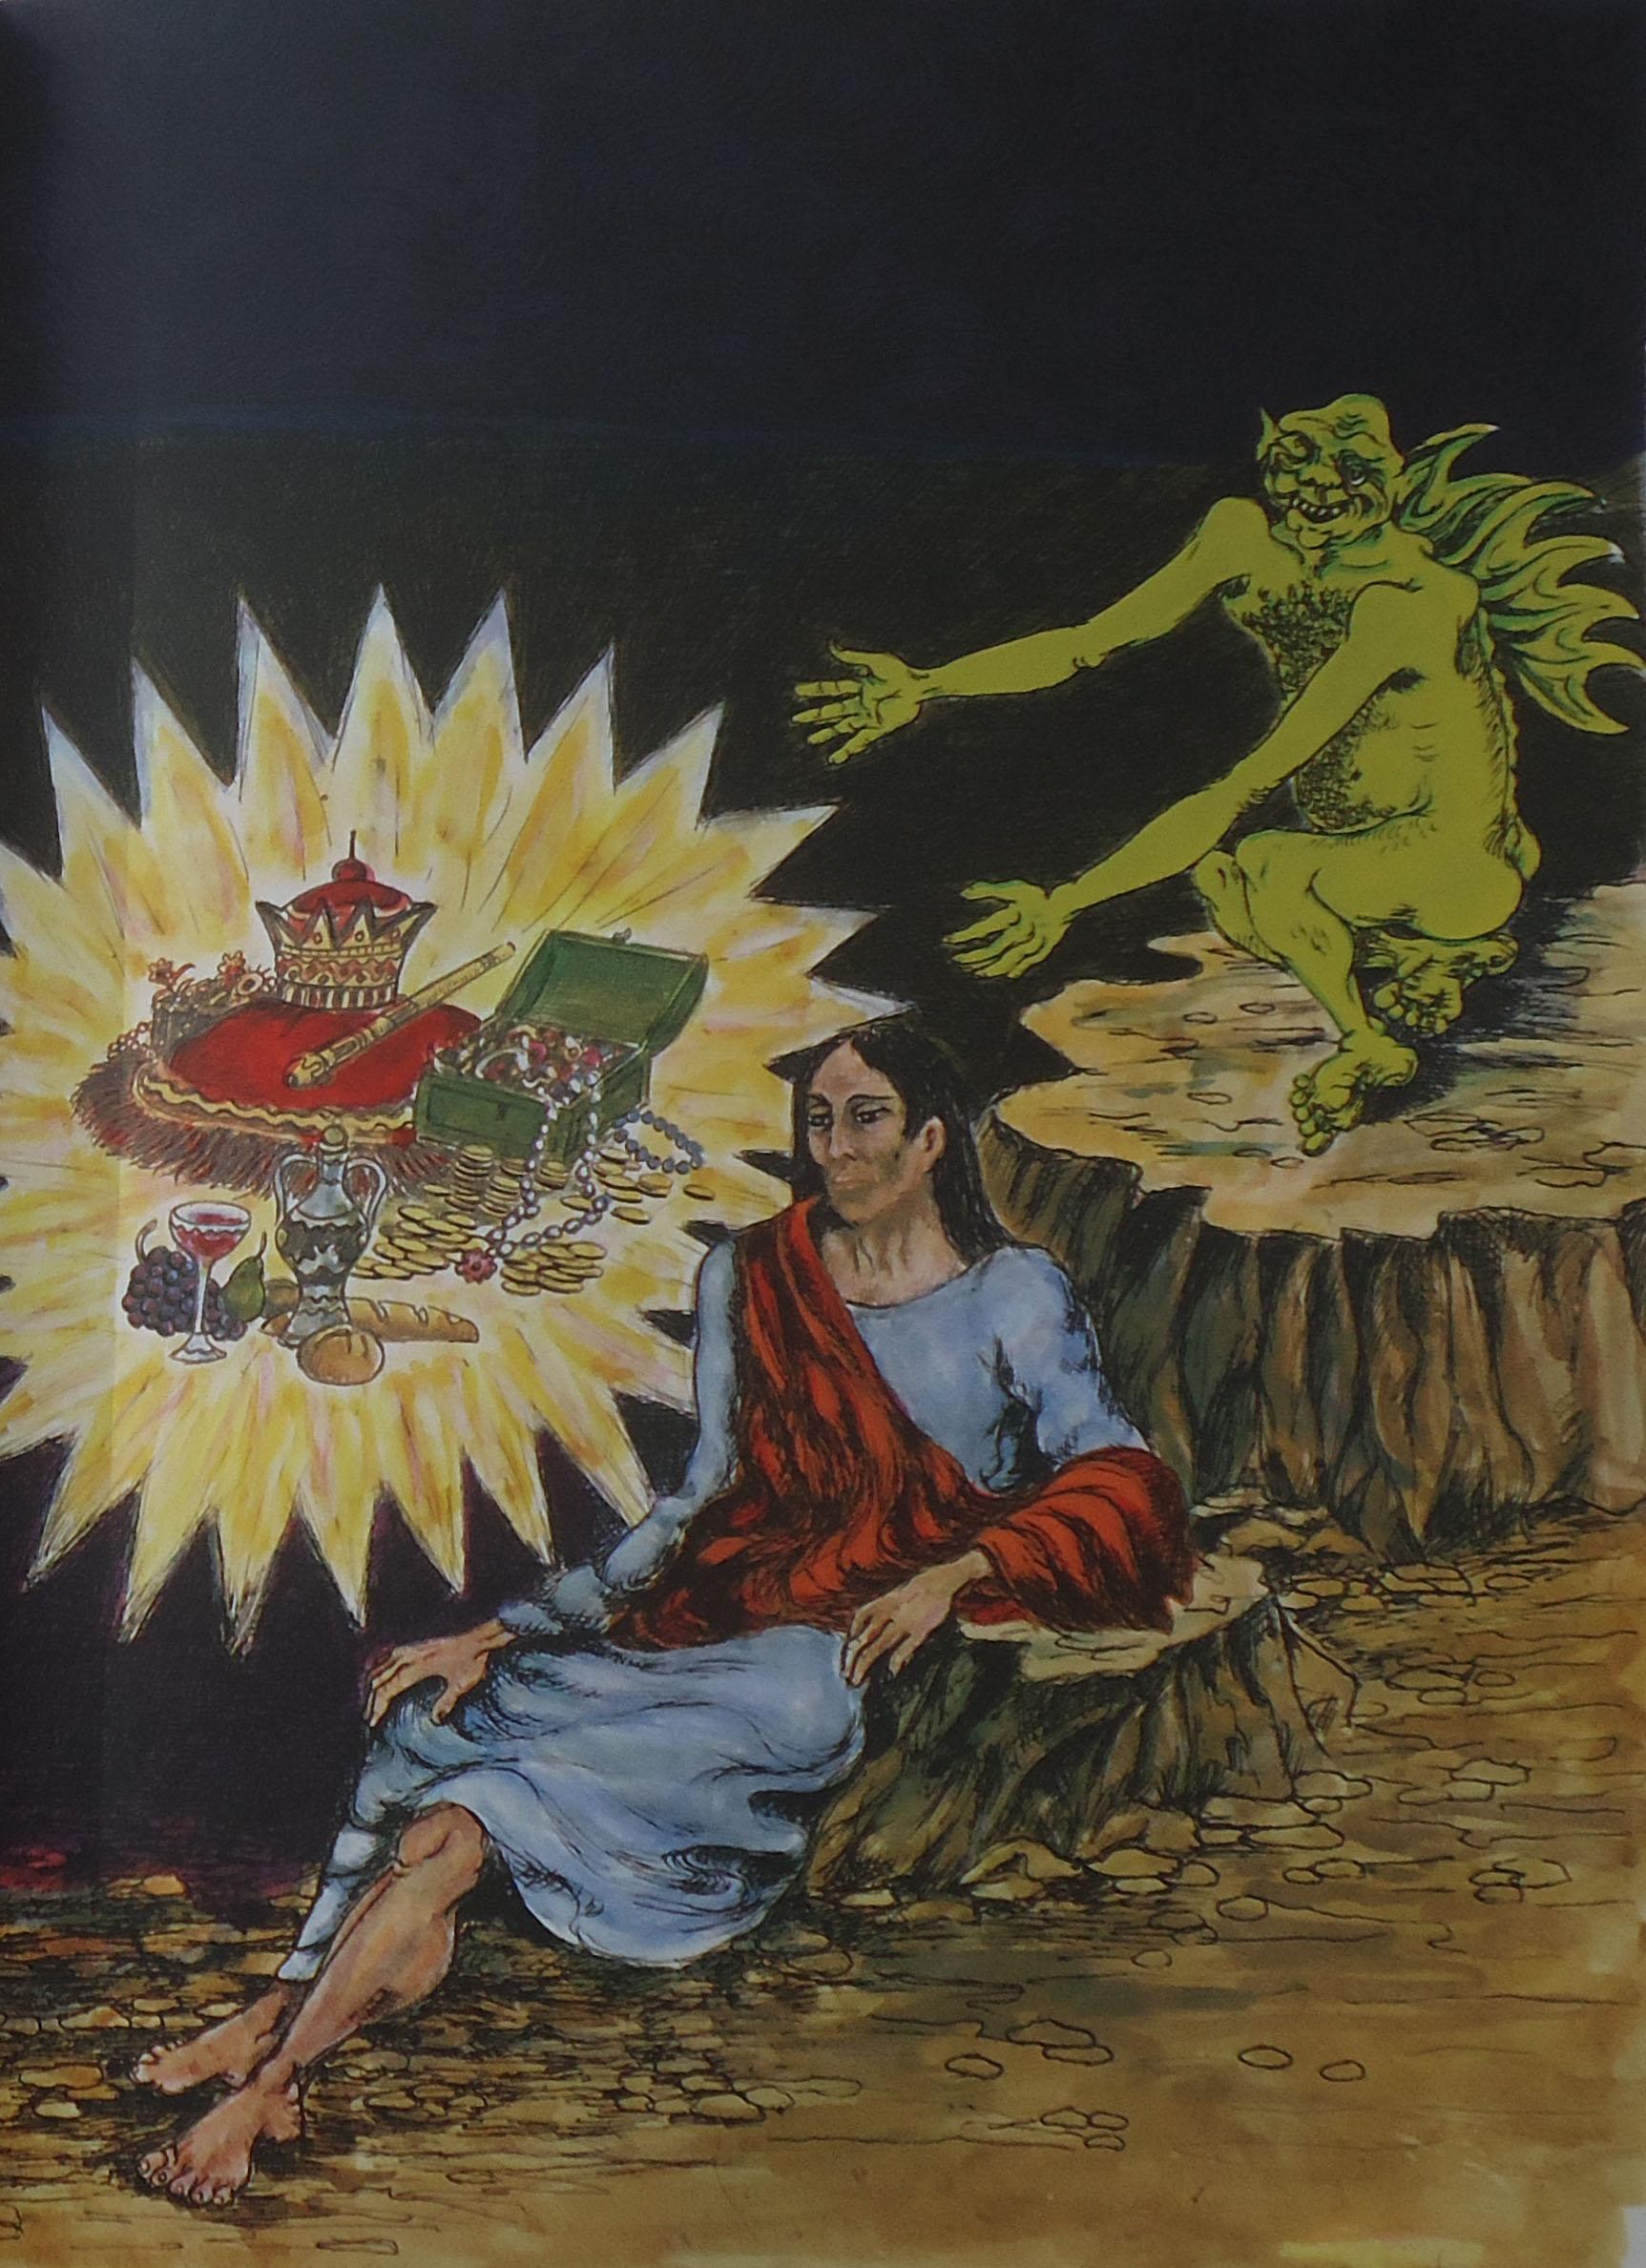 Giuseppe Migneco - Gesù tentato dal diavolo